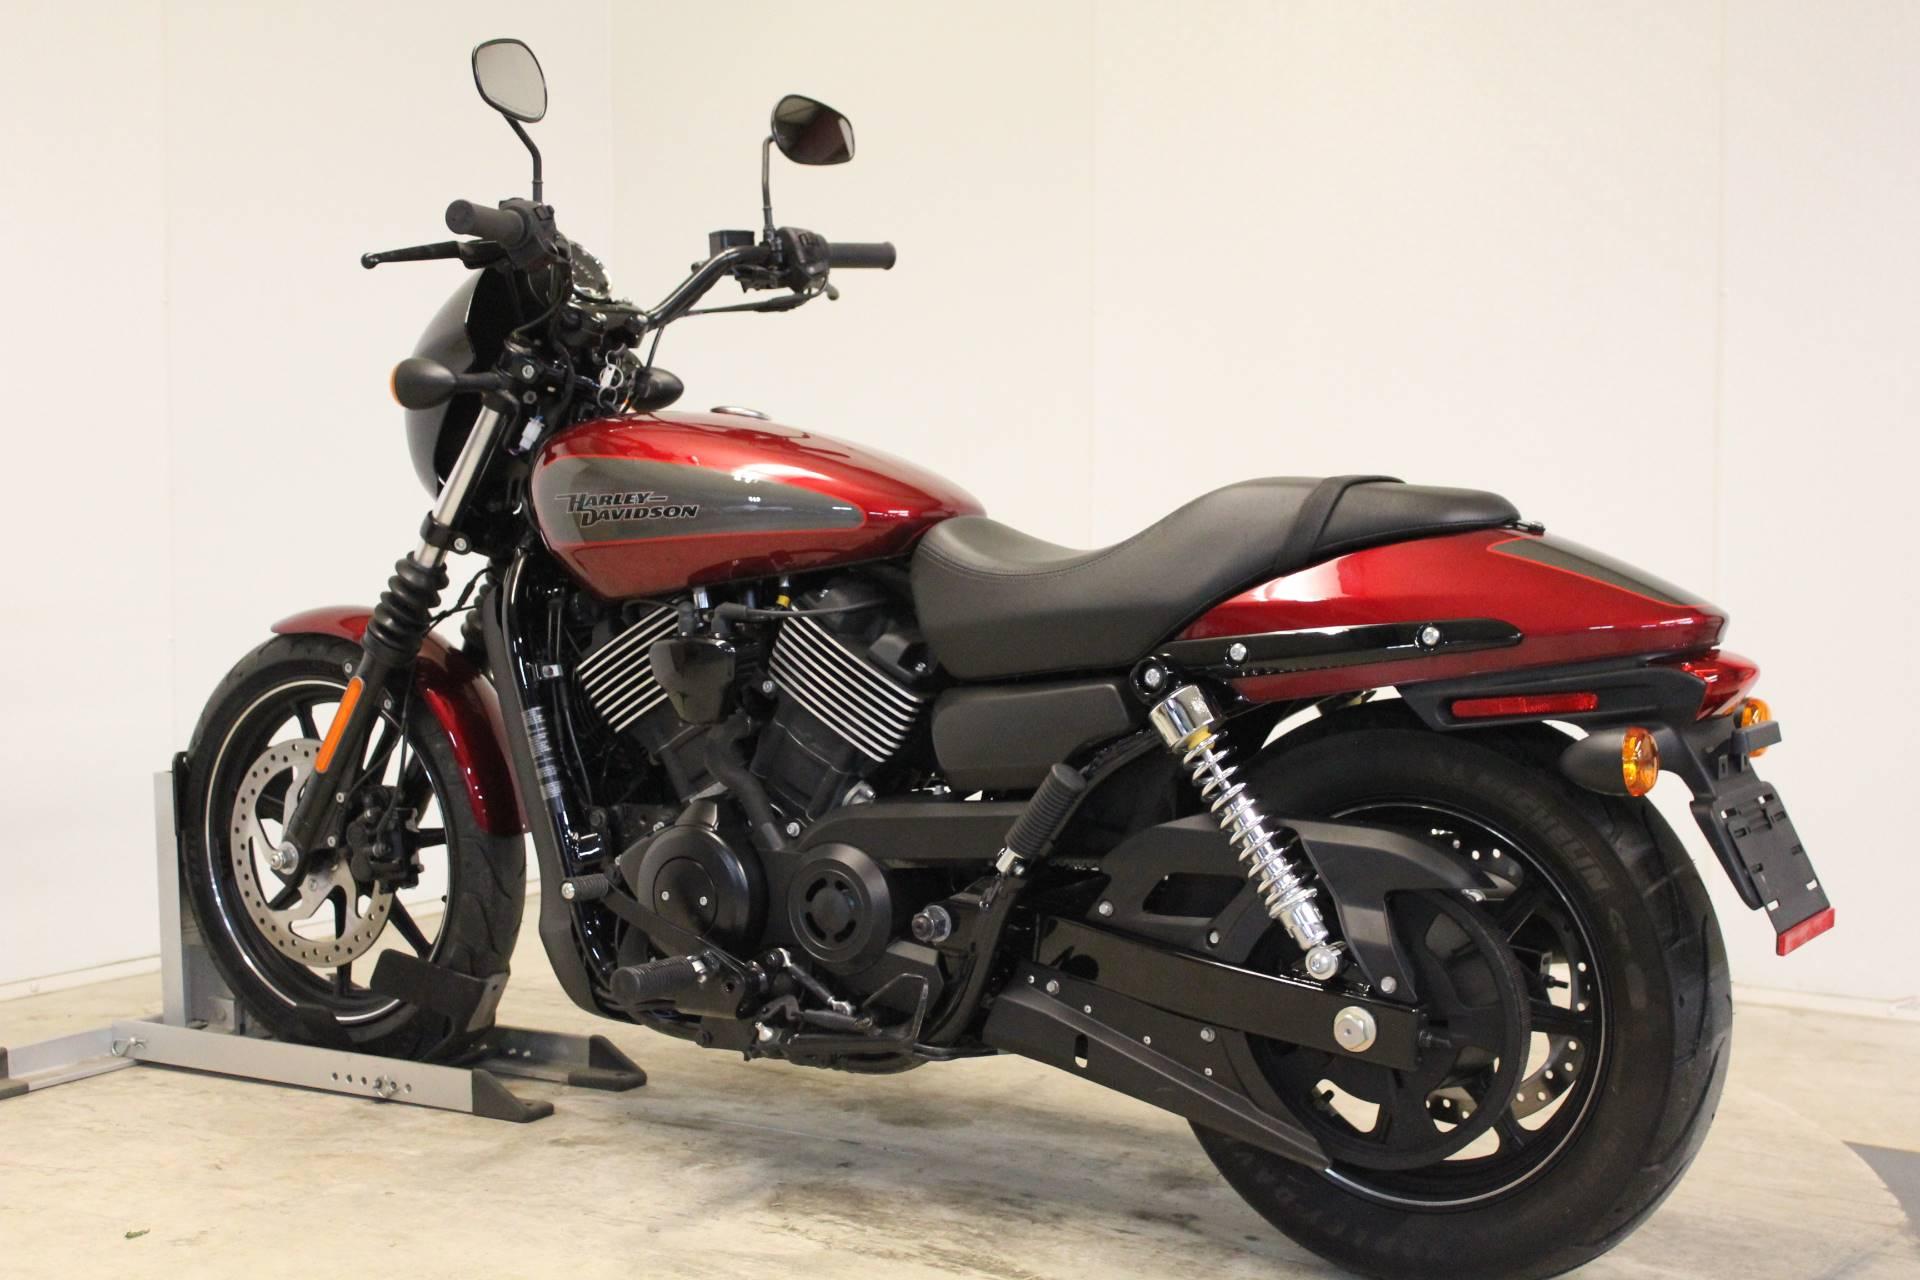 2017 Harley-Davidson Street 750 6